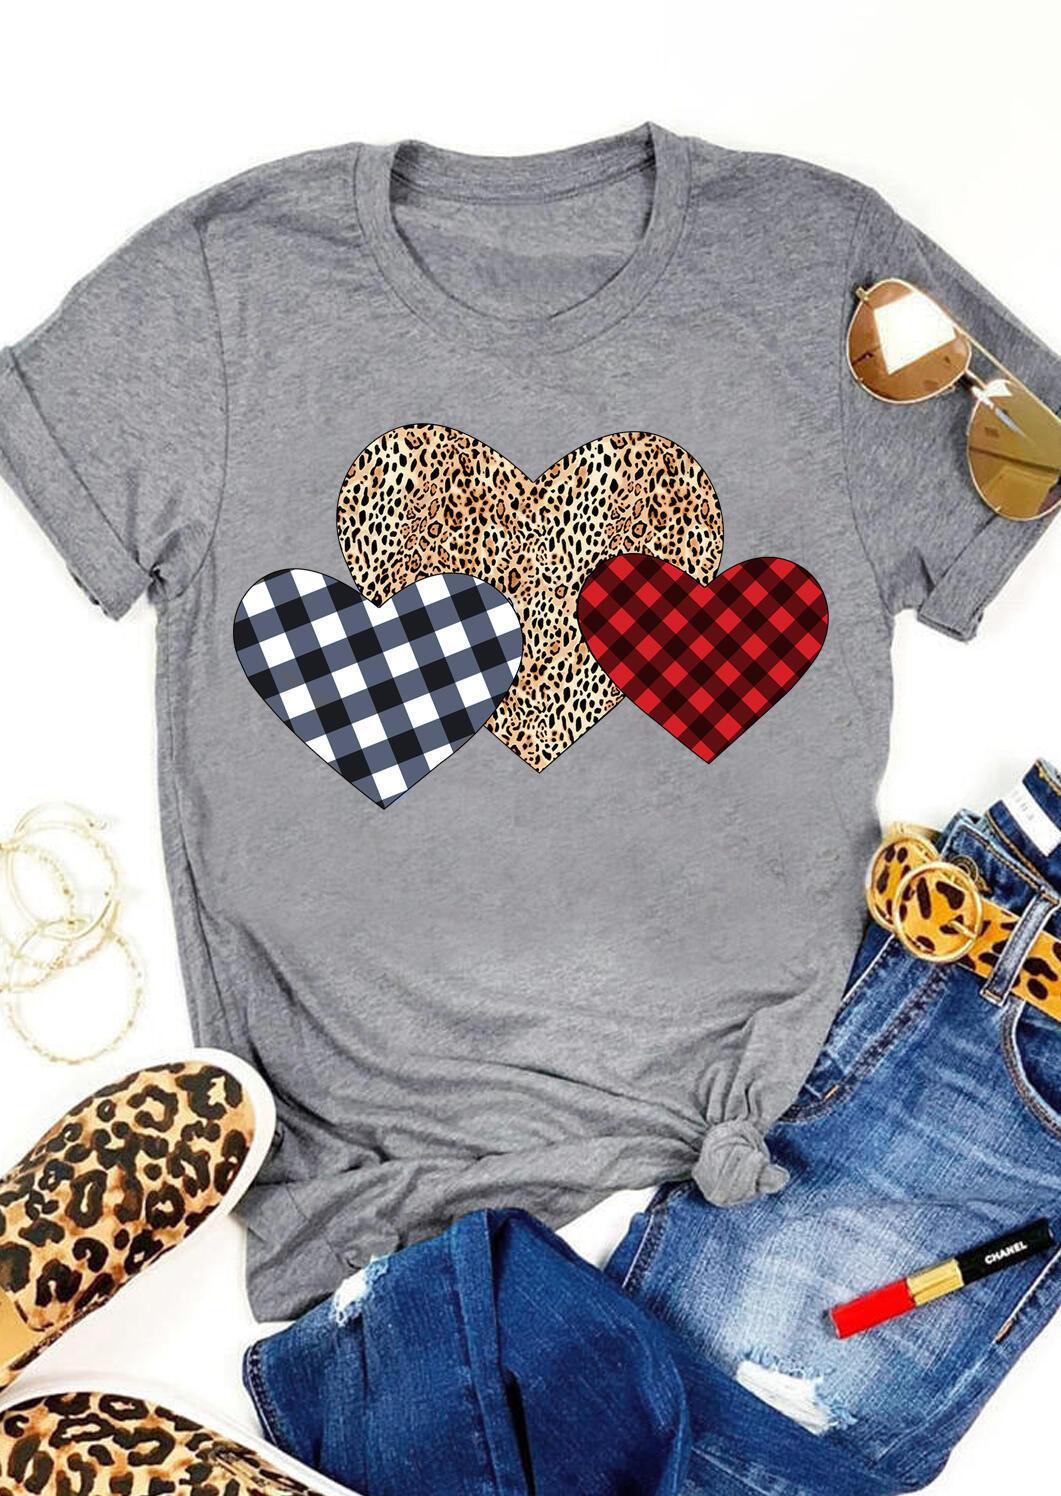 Plaid Leopard Printed Splicing Heart T-Shirt Tee – Gray